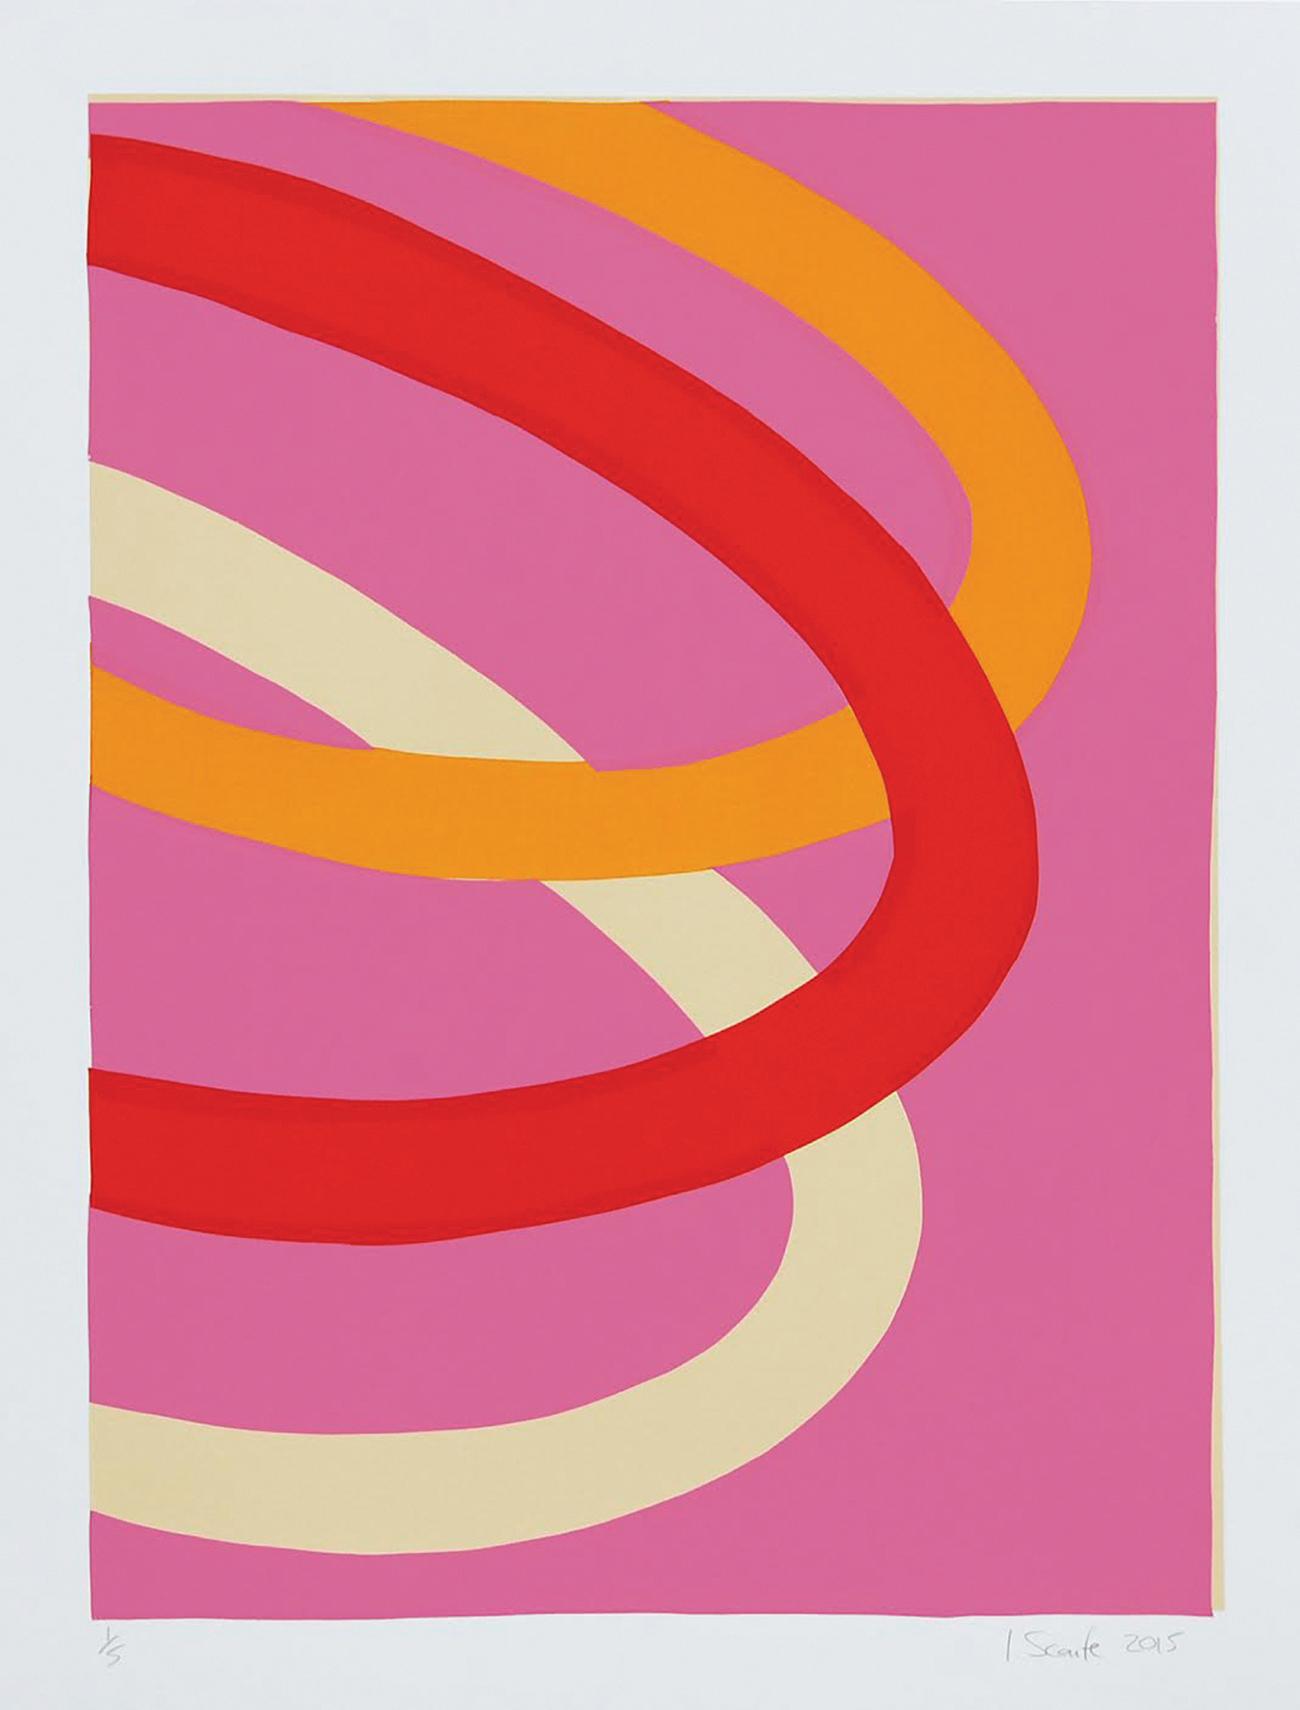 """Pink Loops""   Screenprint,  56 x 41.5cm  2015"